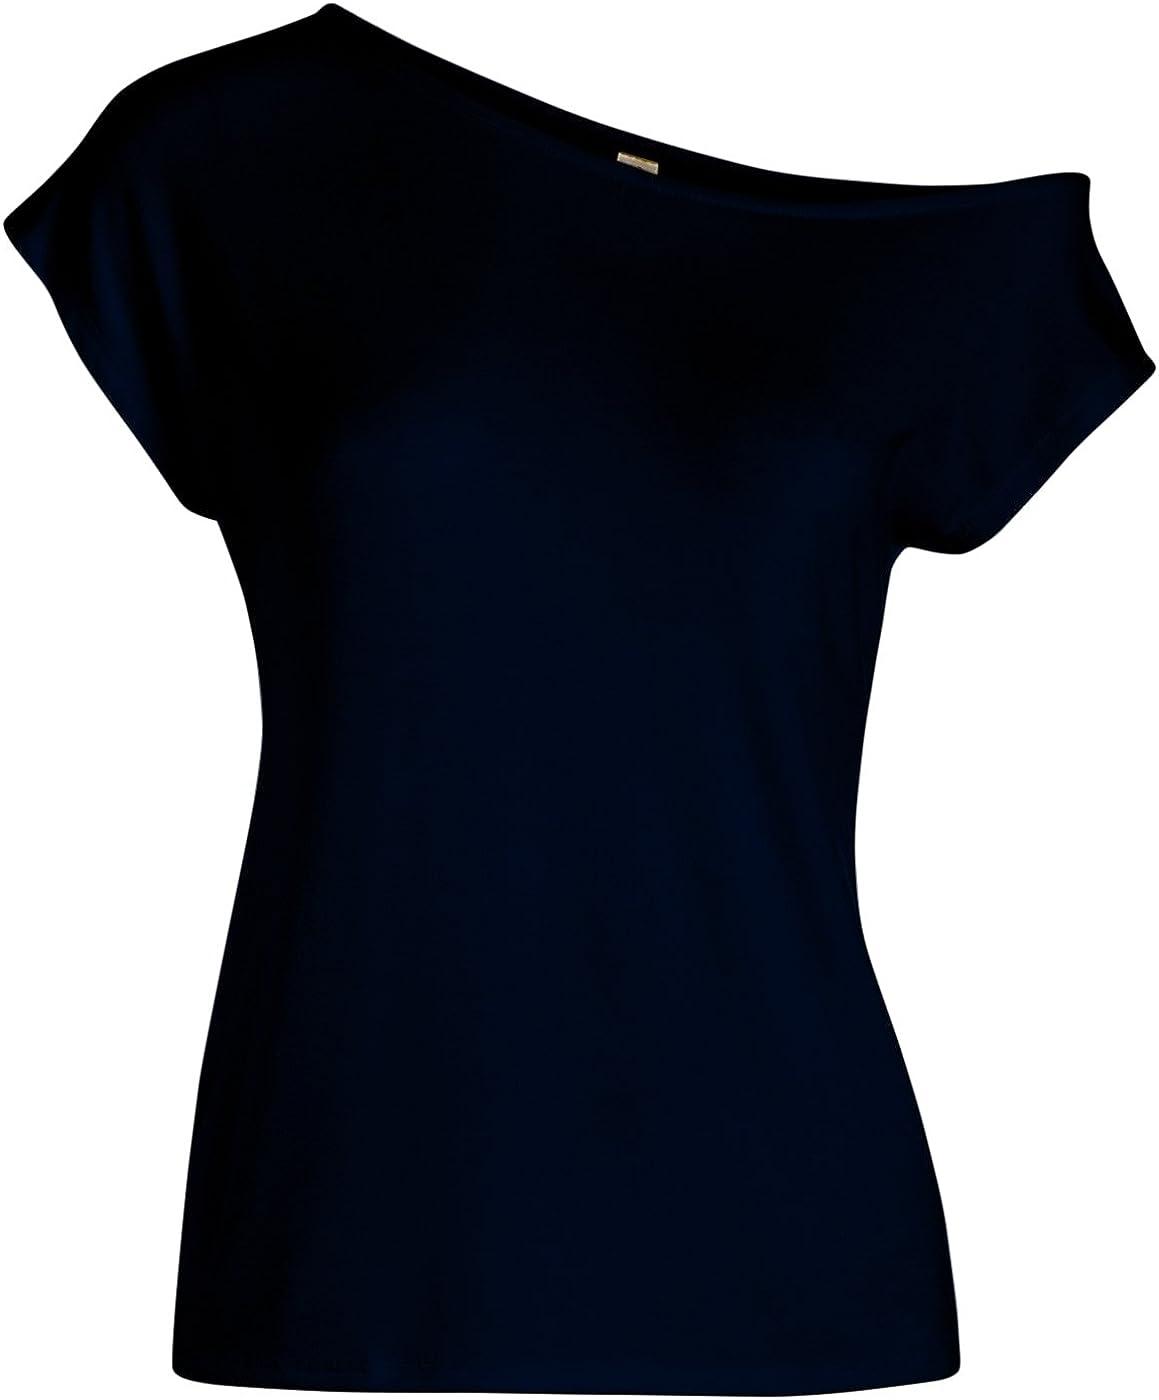 USA Simlu Womens Loose Off Shoulder Tops Short Sleeve Casual T Shirt Top